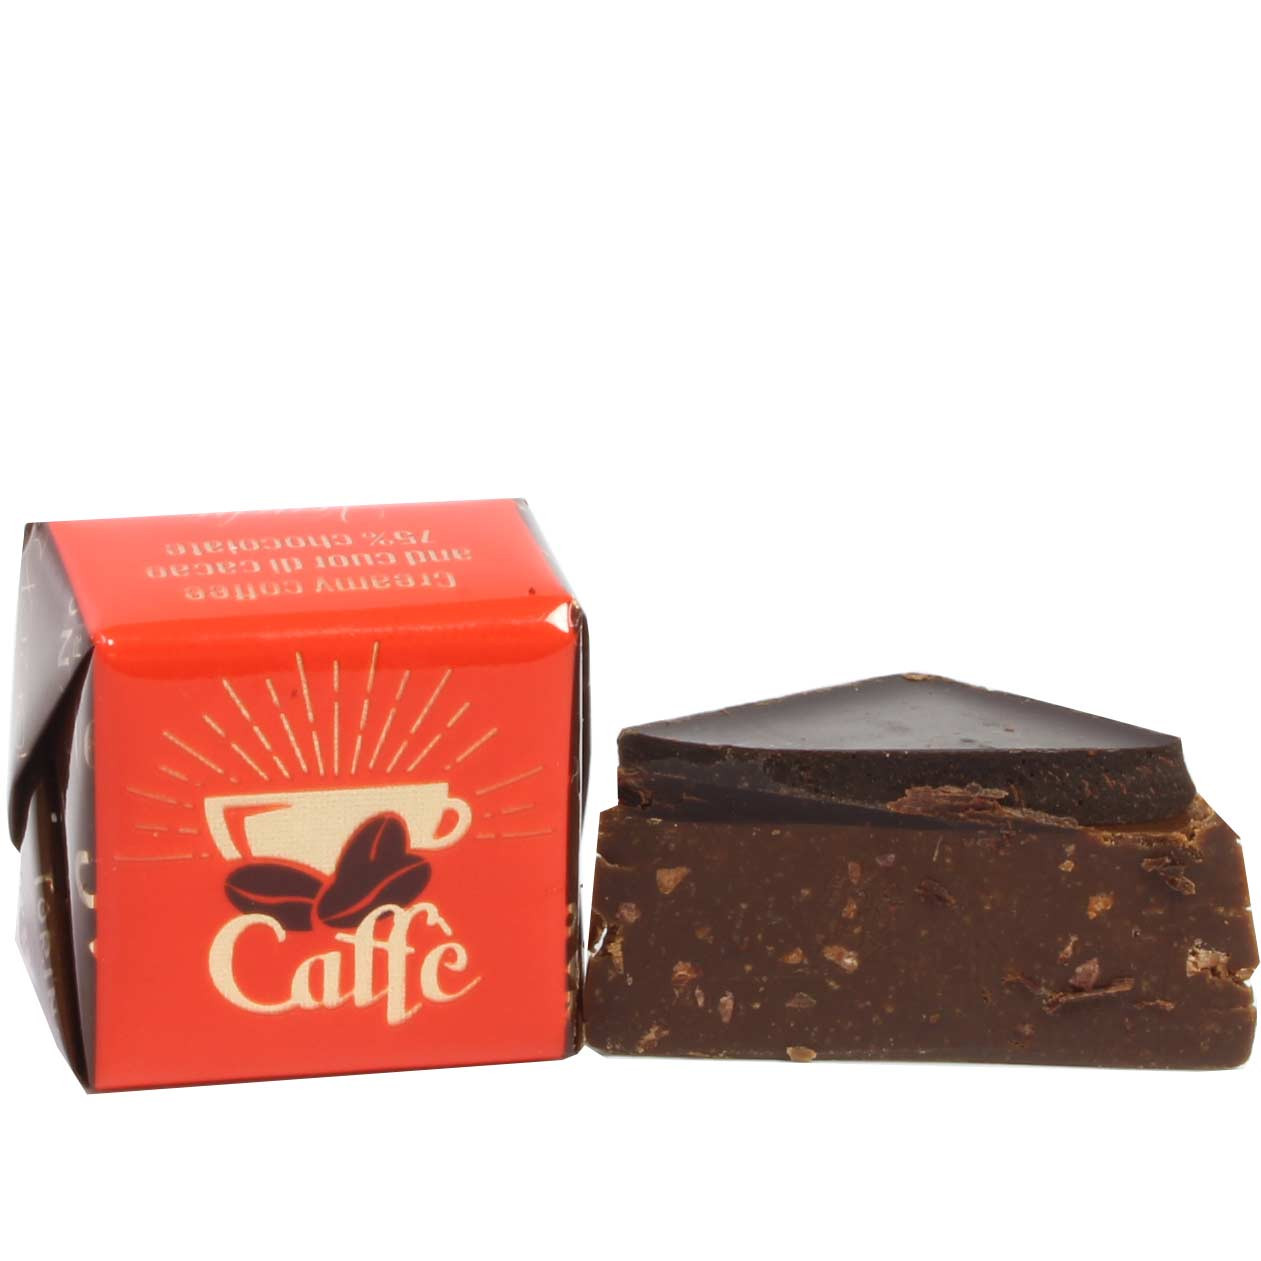 Cremoso al caffé e cuor di cacao 75% Schichtpraline mit Kaffee - SweetFingerfood, sin alcohol, sin gluten, Italia, chocolate italiano, Chocolate con café - Chocolats-De-Luxe